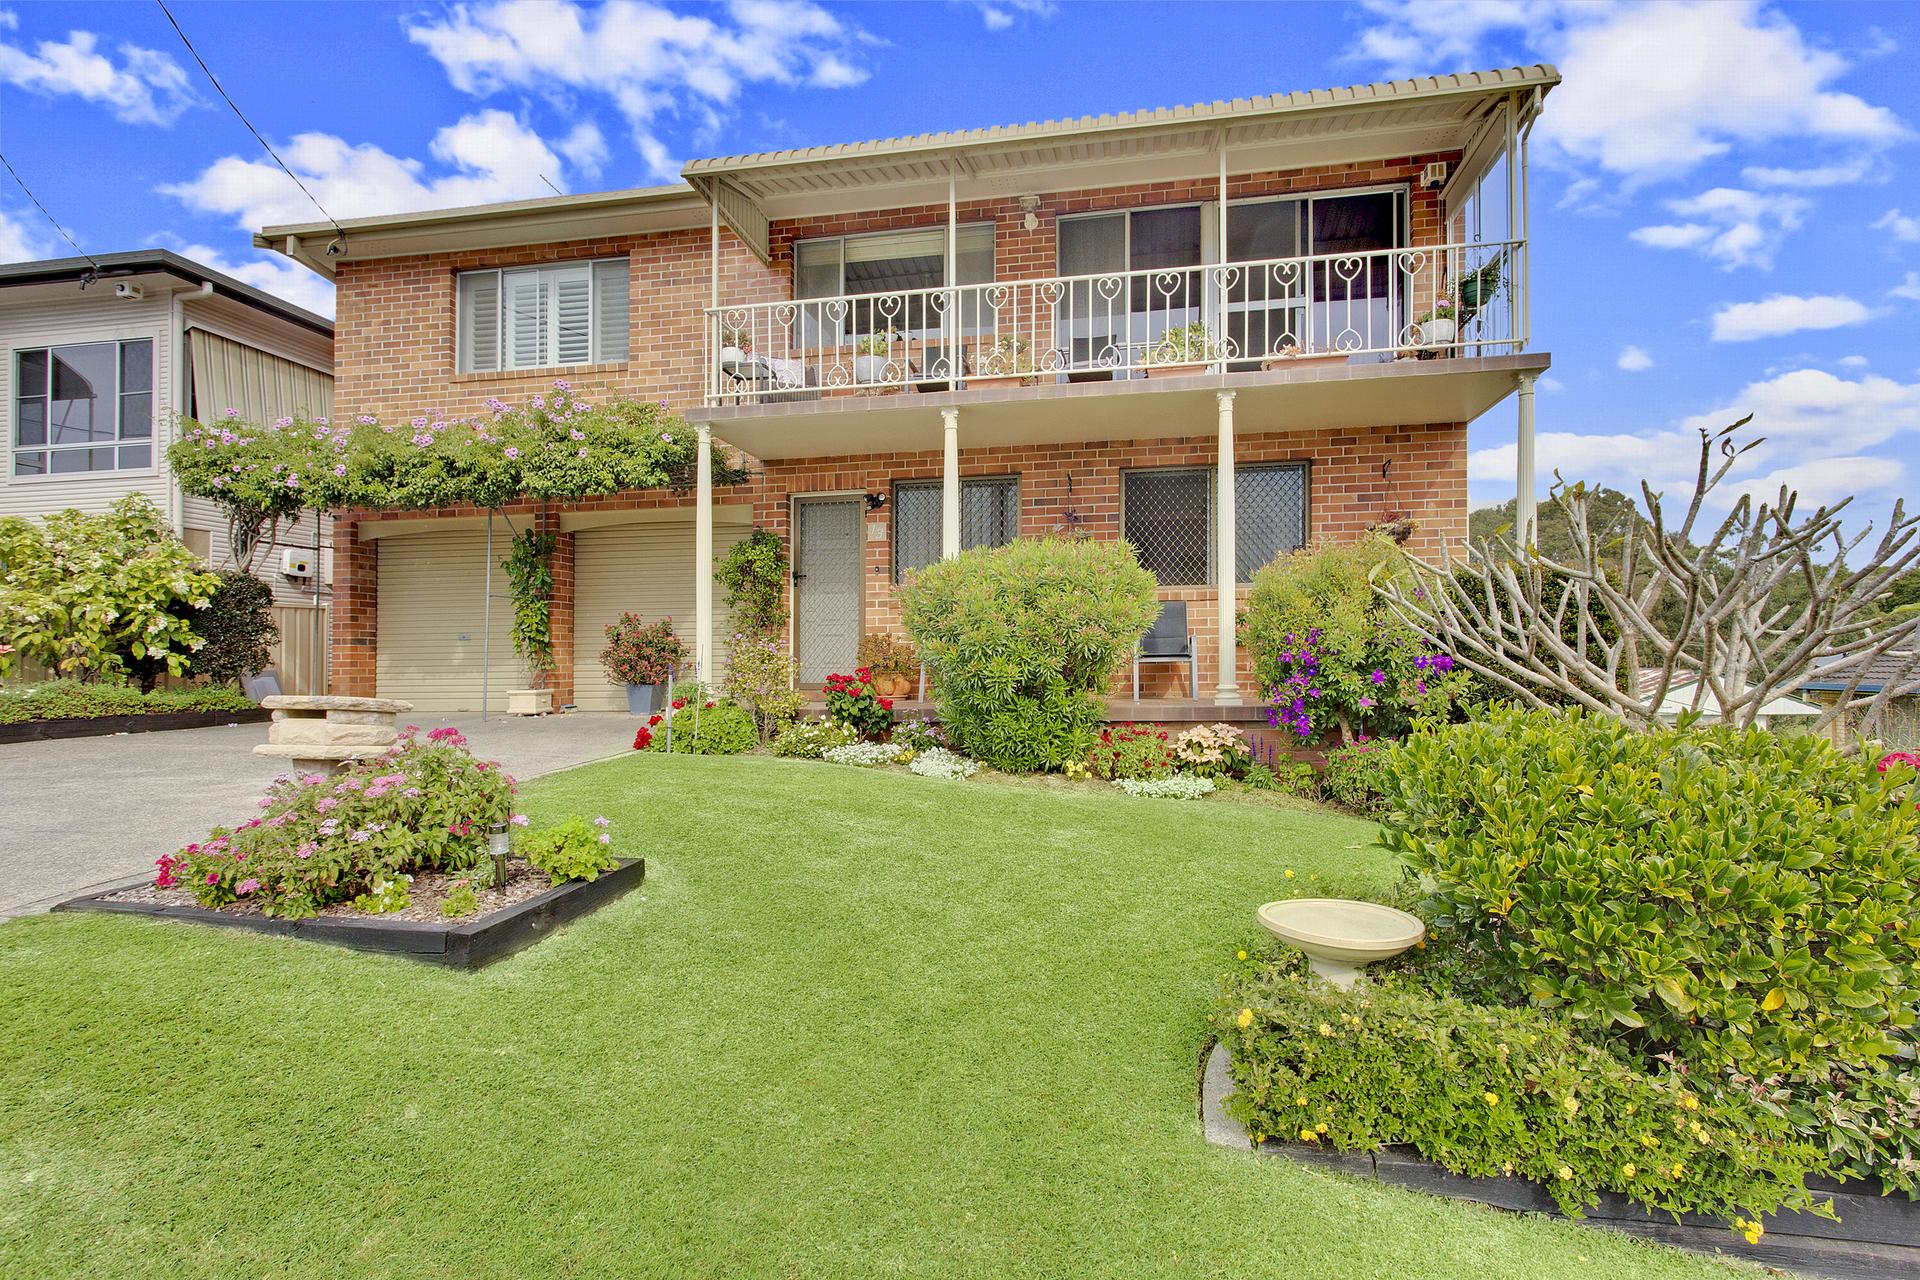 13 Taylor Street, Kempsey, NSW, 2440 - Image 1